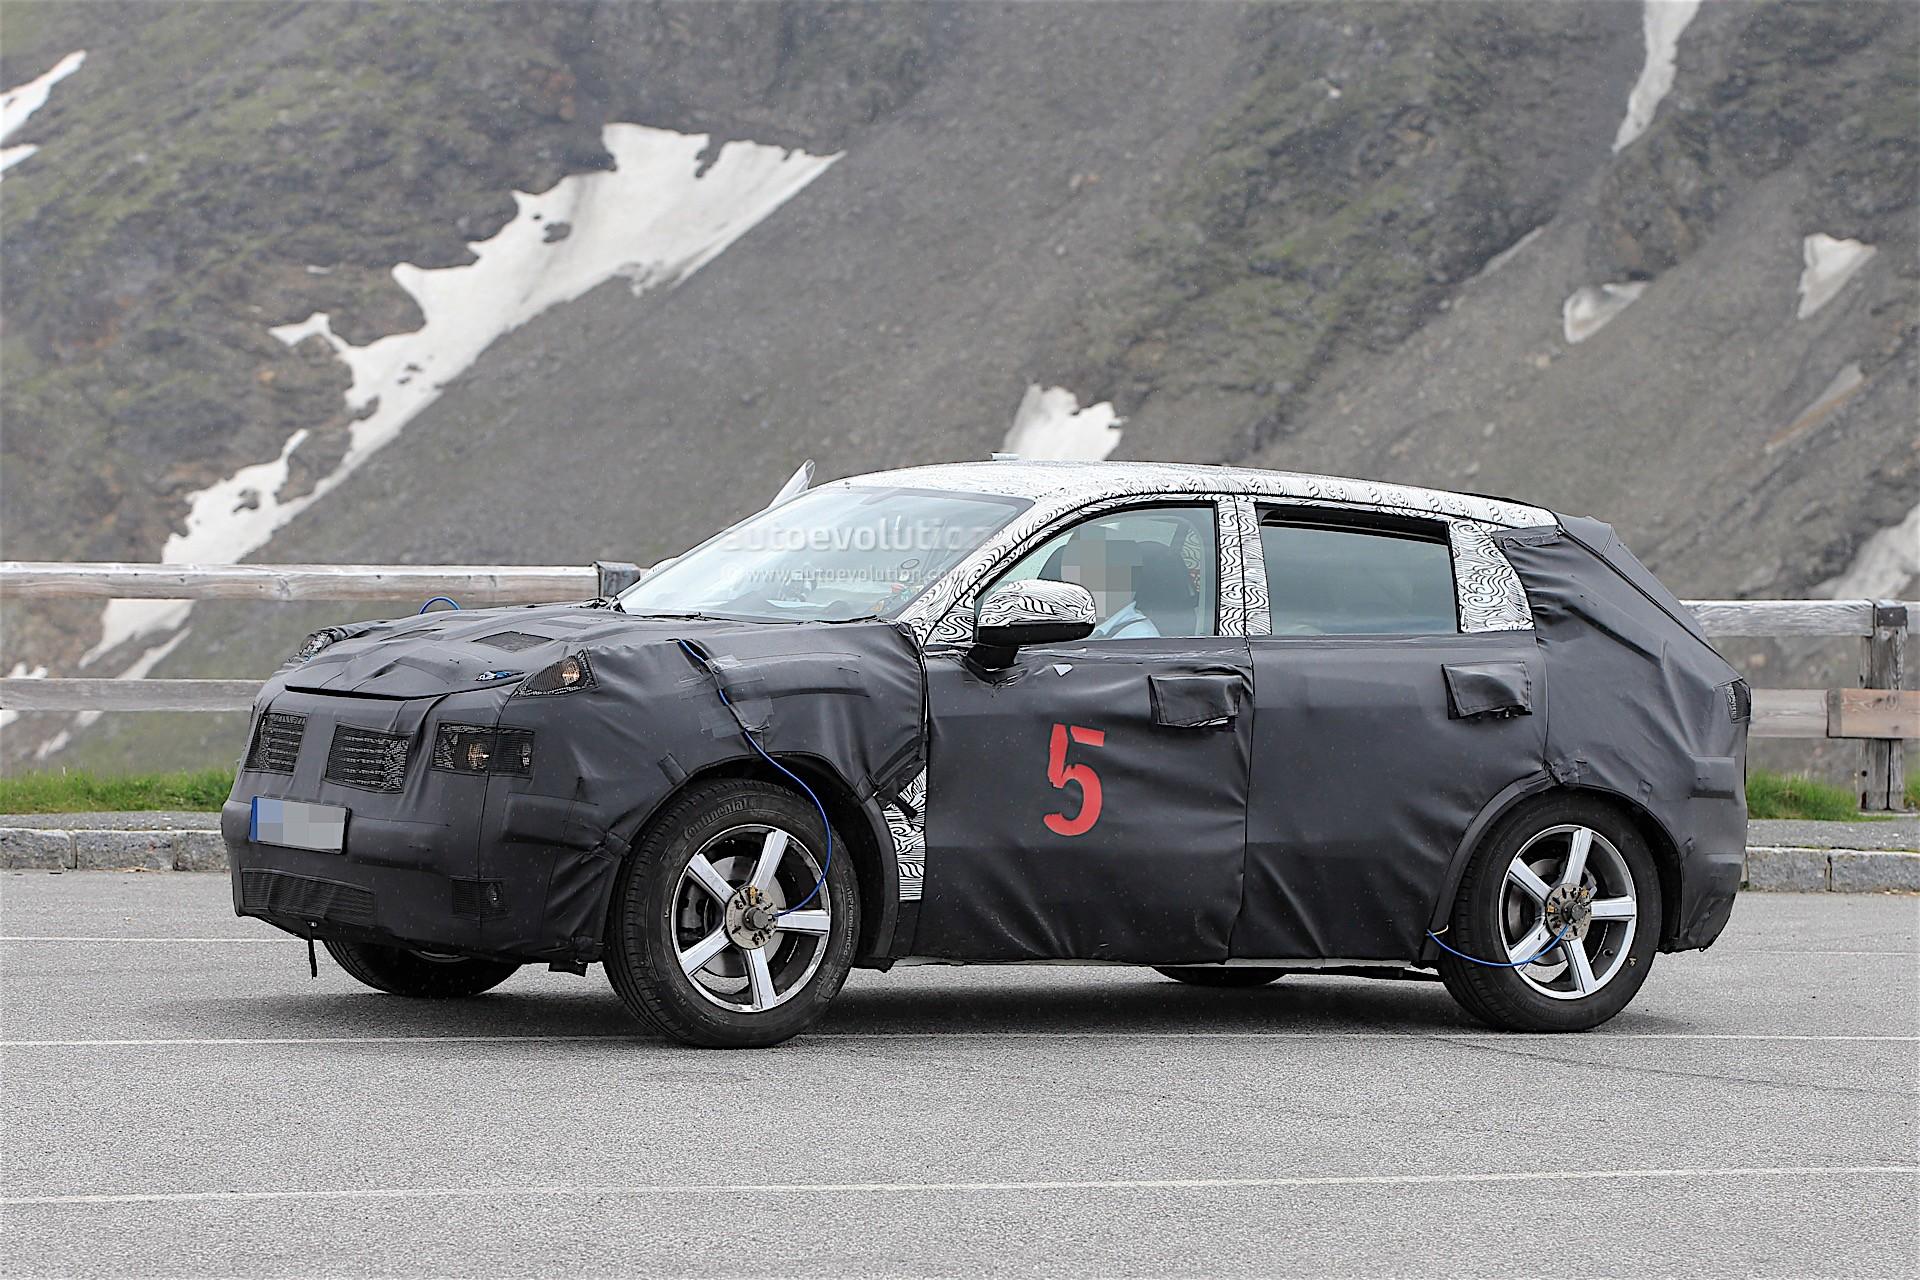 2017 - [Lynk&Co] 01 SUV Geely-suv-spy_4